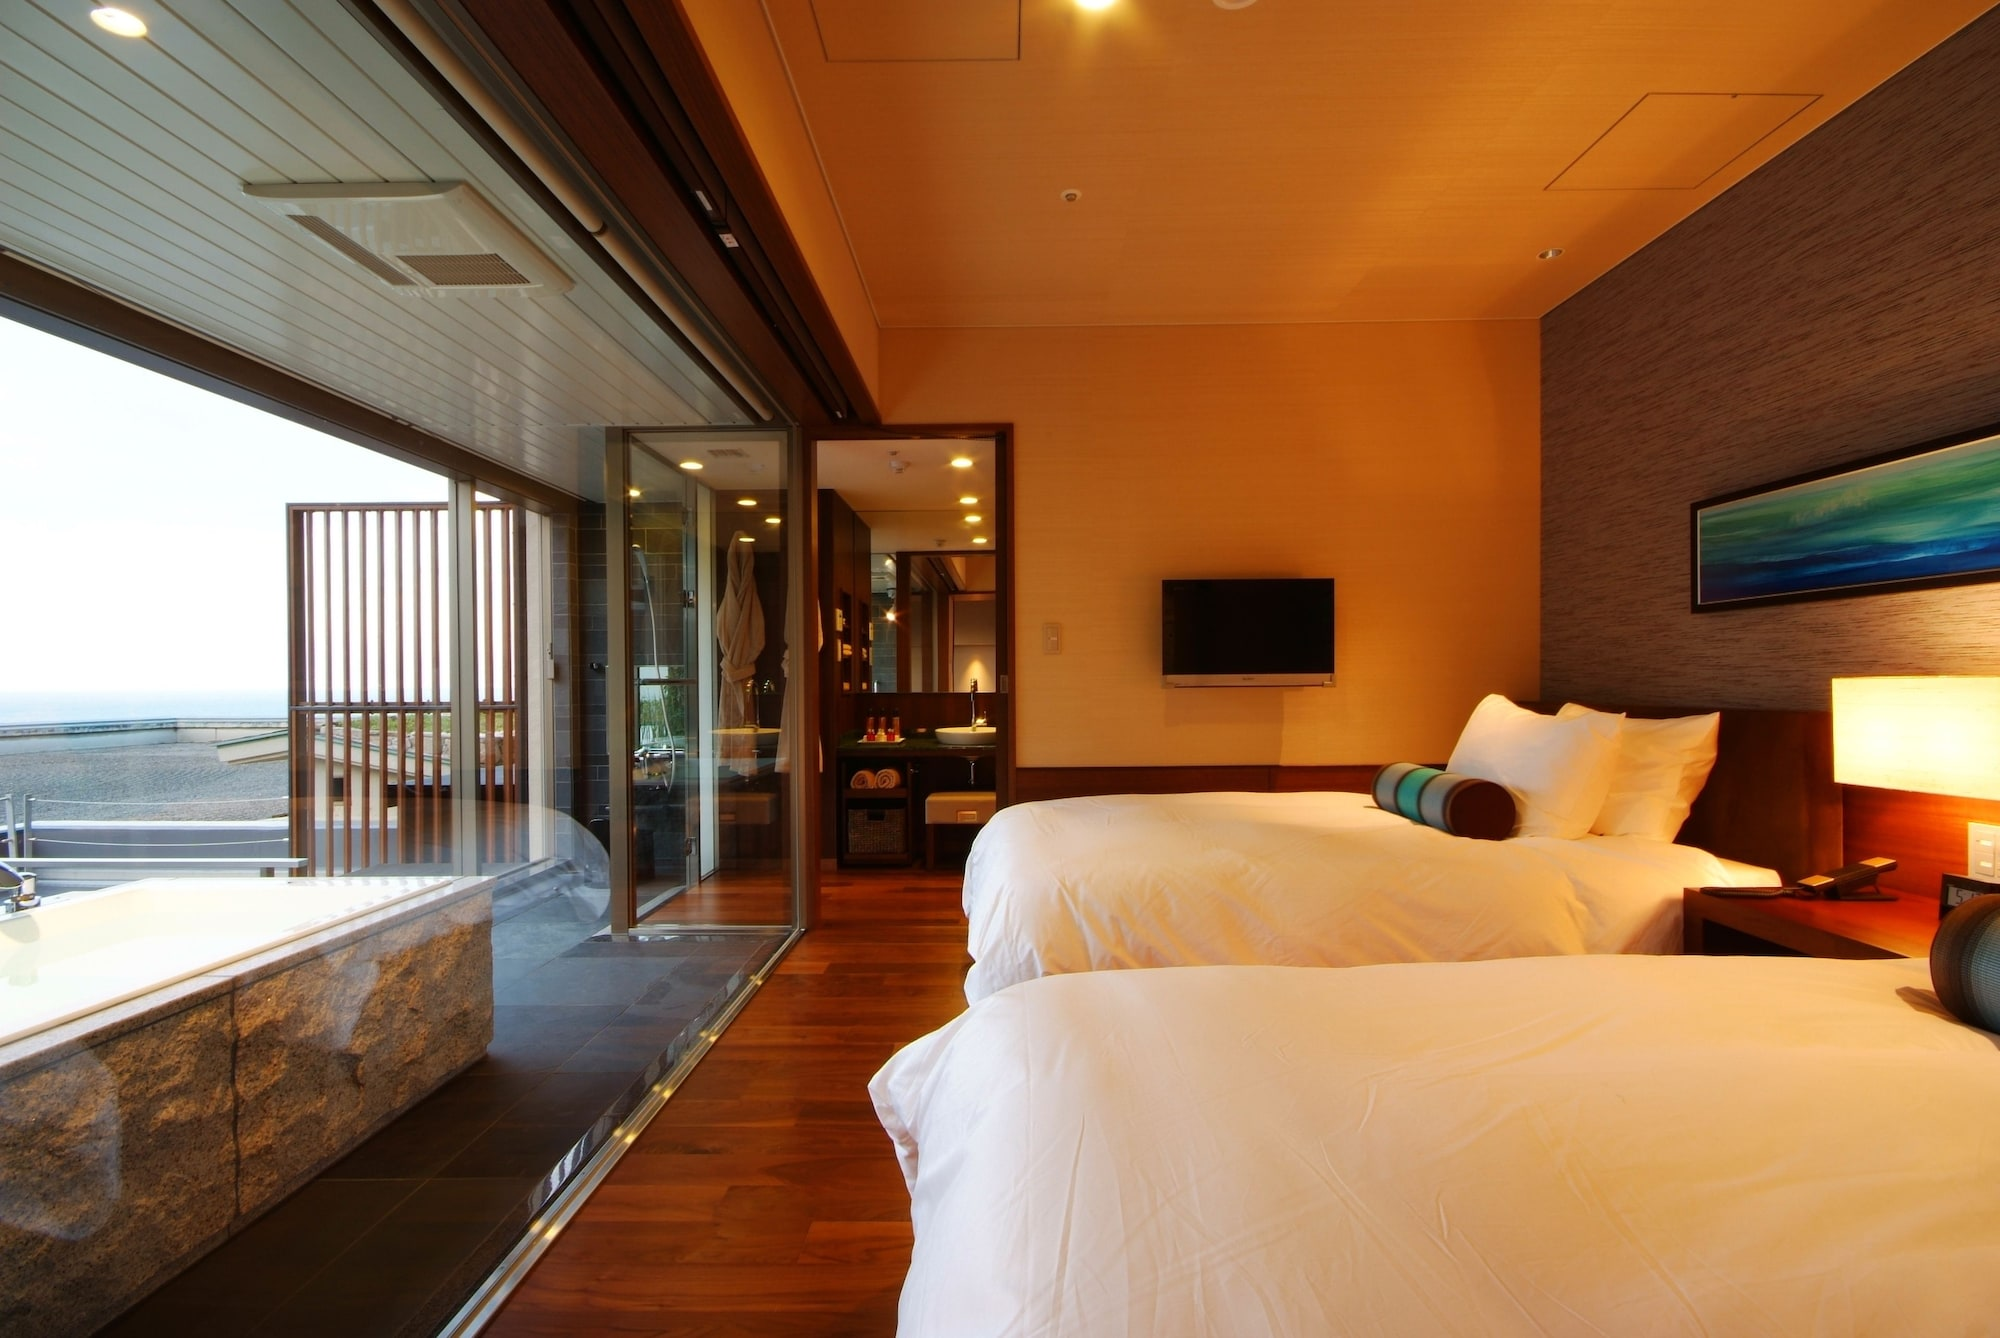 Hotel Kinparo, Toyooka